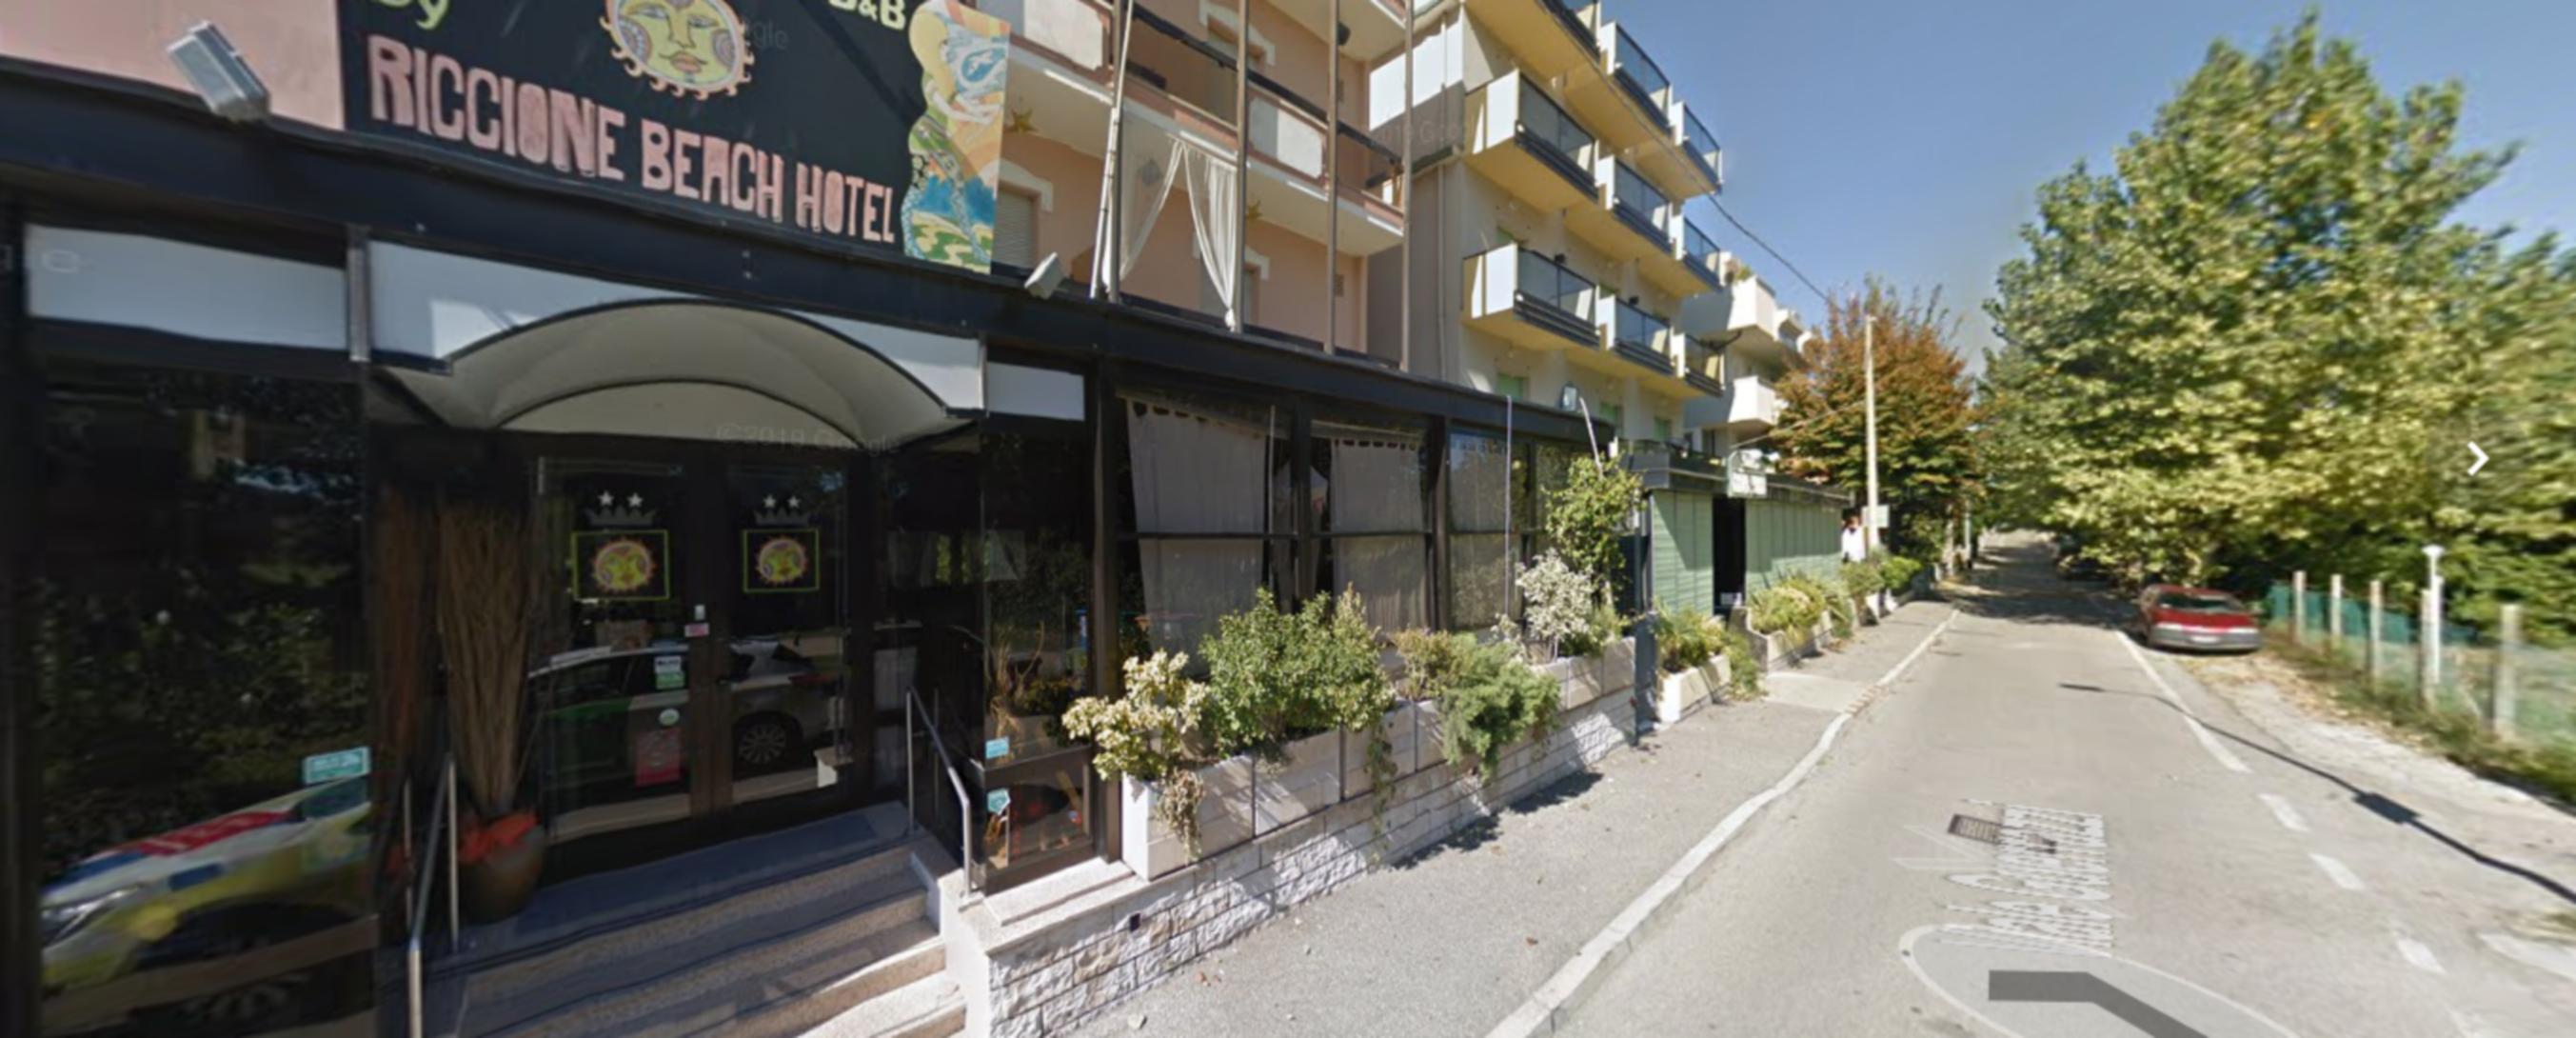 A close up of a street at Riccione Beach Hotel .